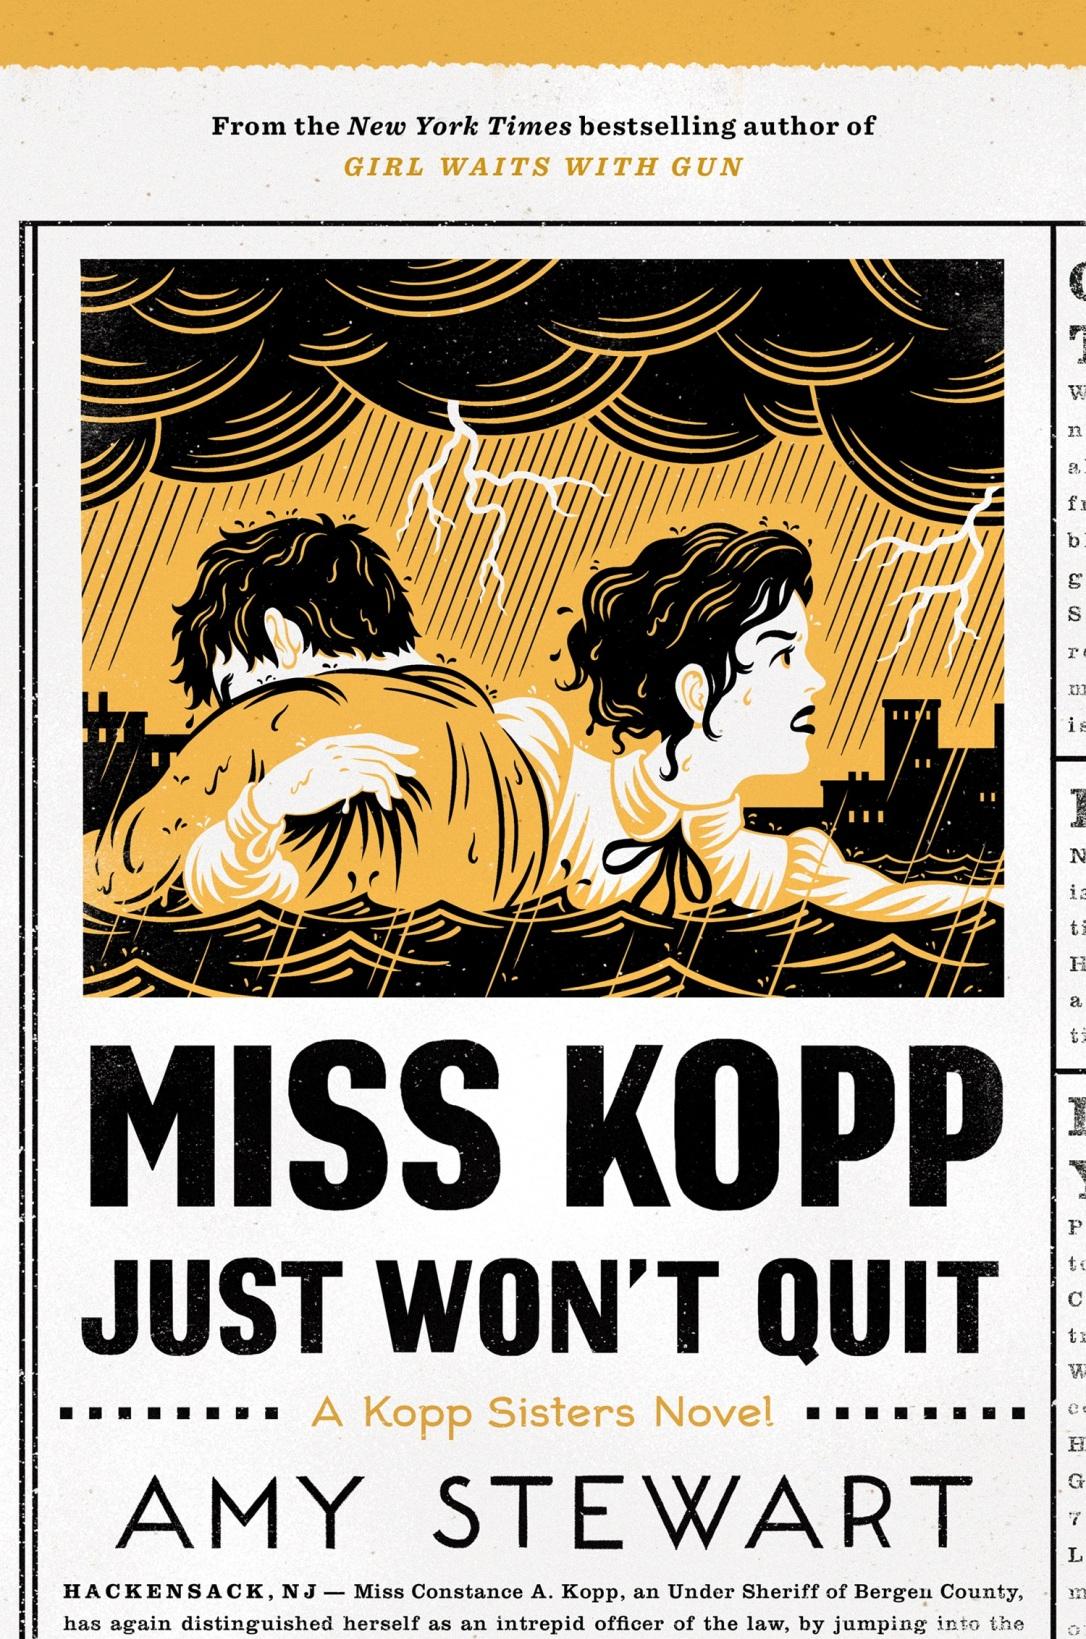 Miss-Kopp-Just-Wont-Quit